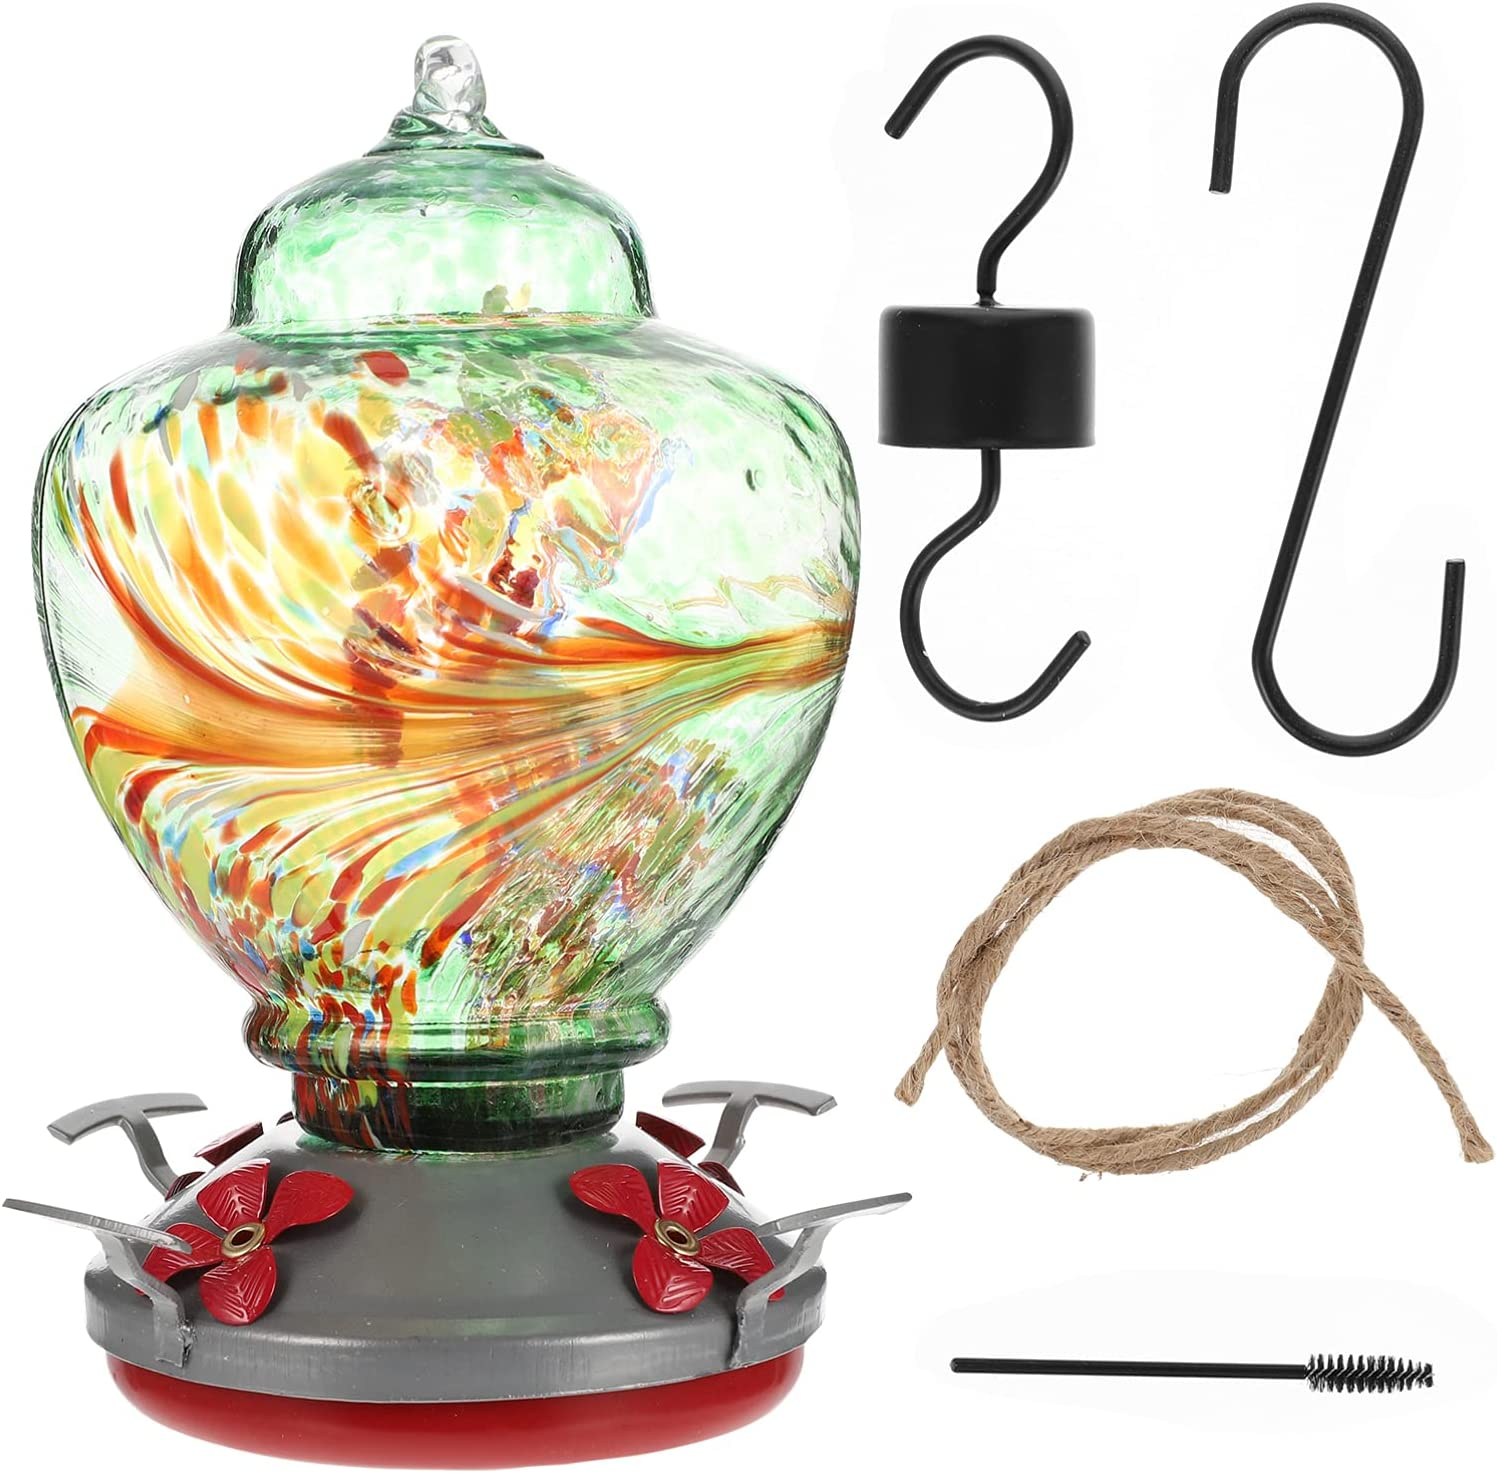 Hemoton 1 Set Glass Hummingbird Outdoor Wild Feeders Super sale period limited Hanging Ranking TOP12 Bir